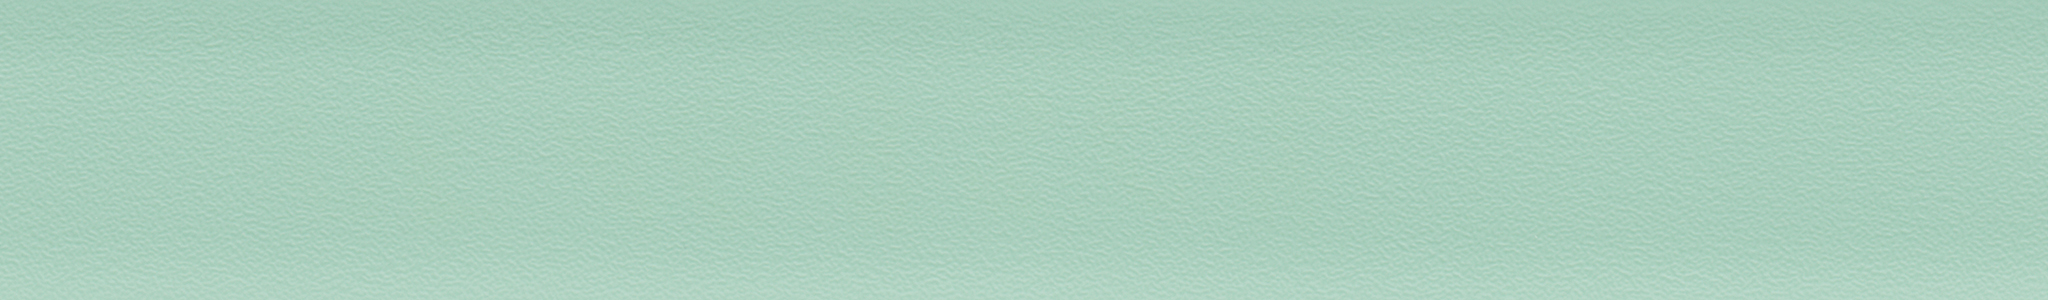 HU 16512 кромка ABS зеленая жемчуг 101